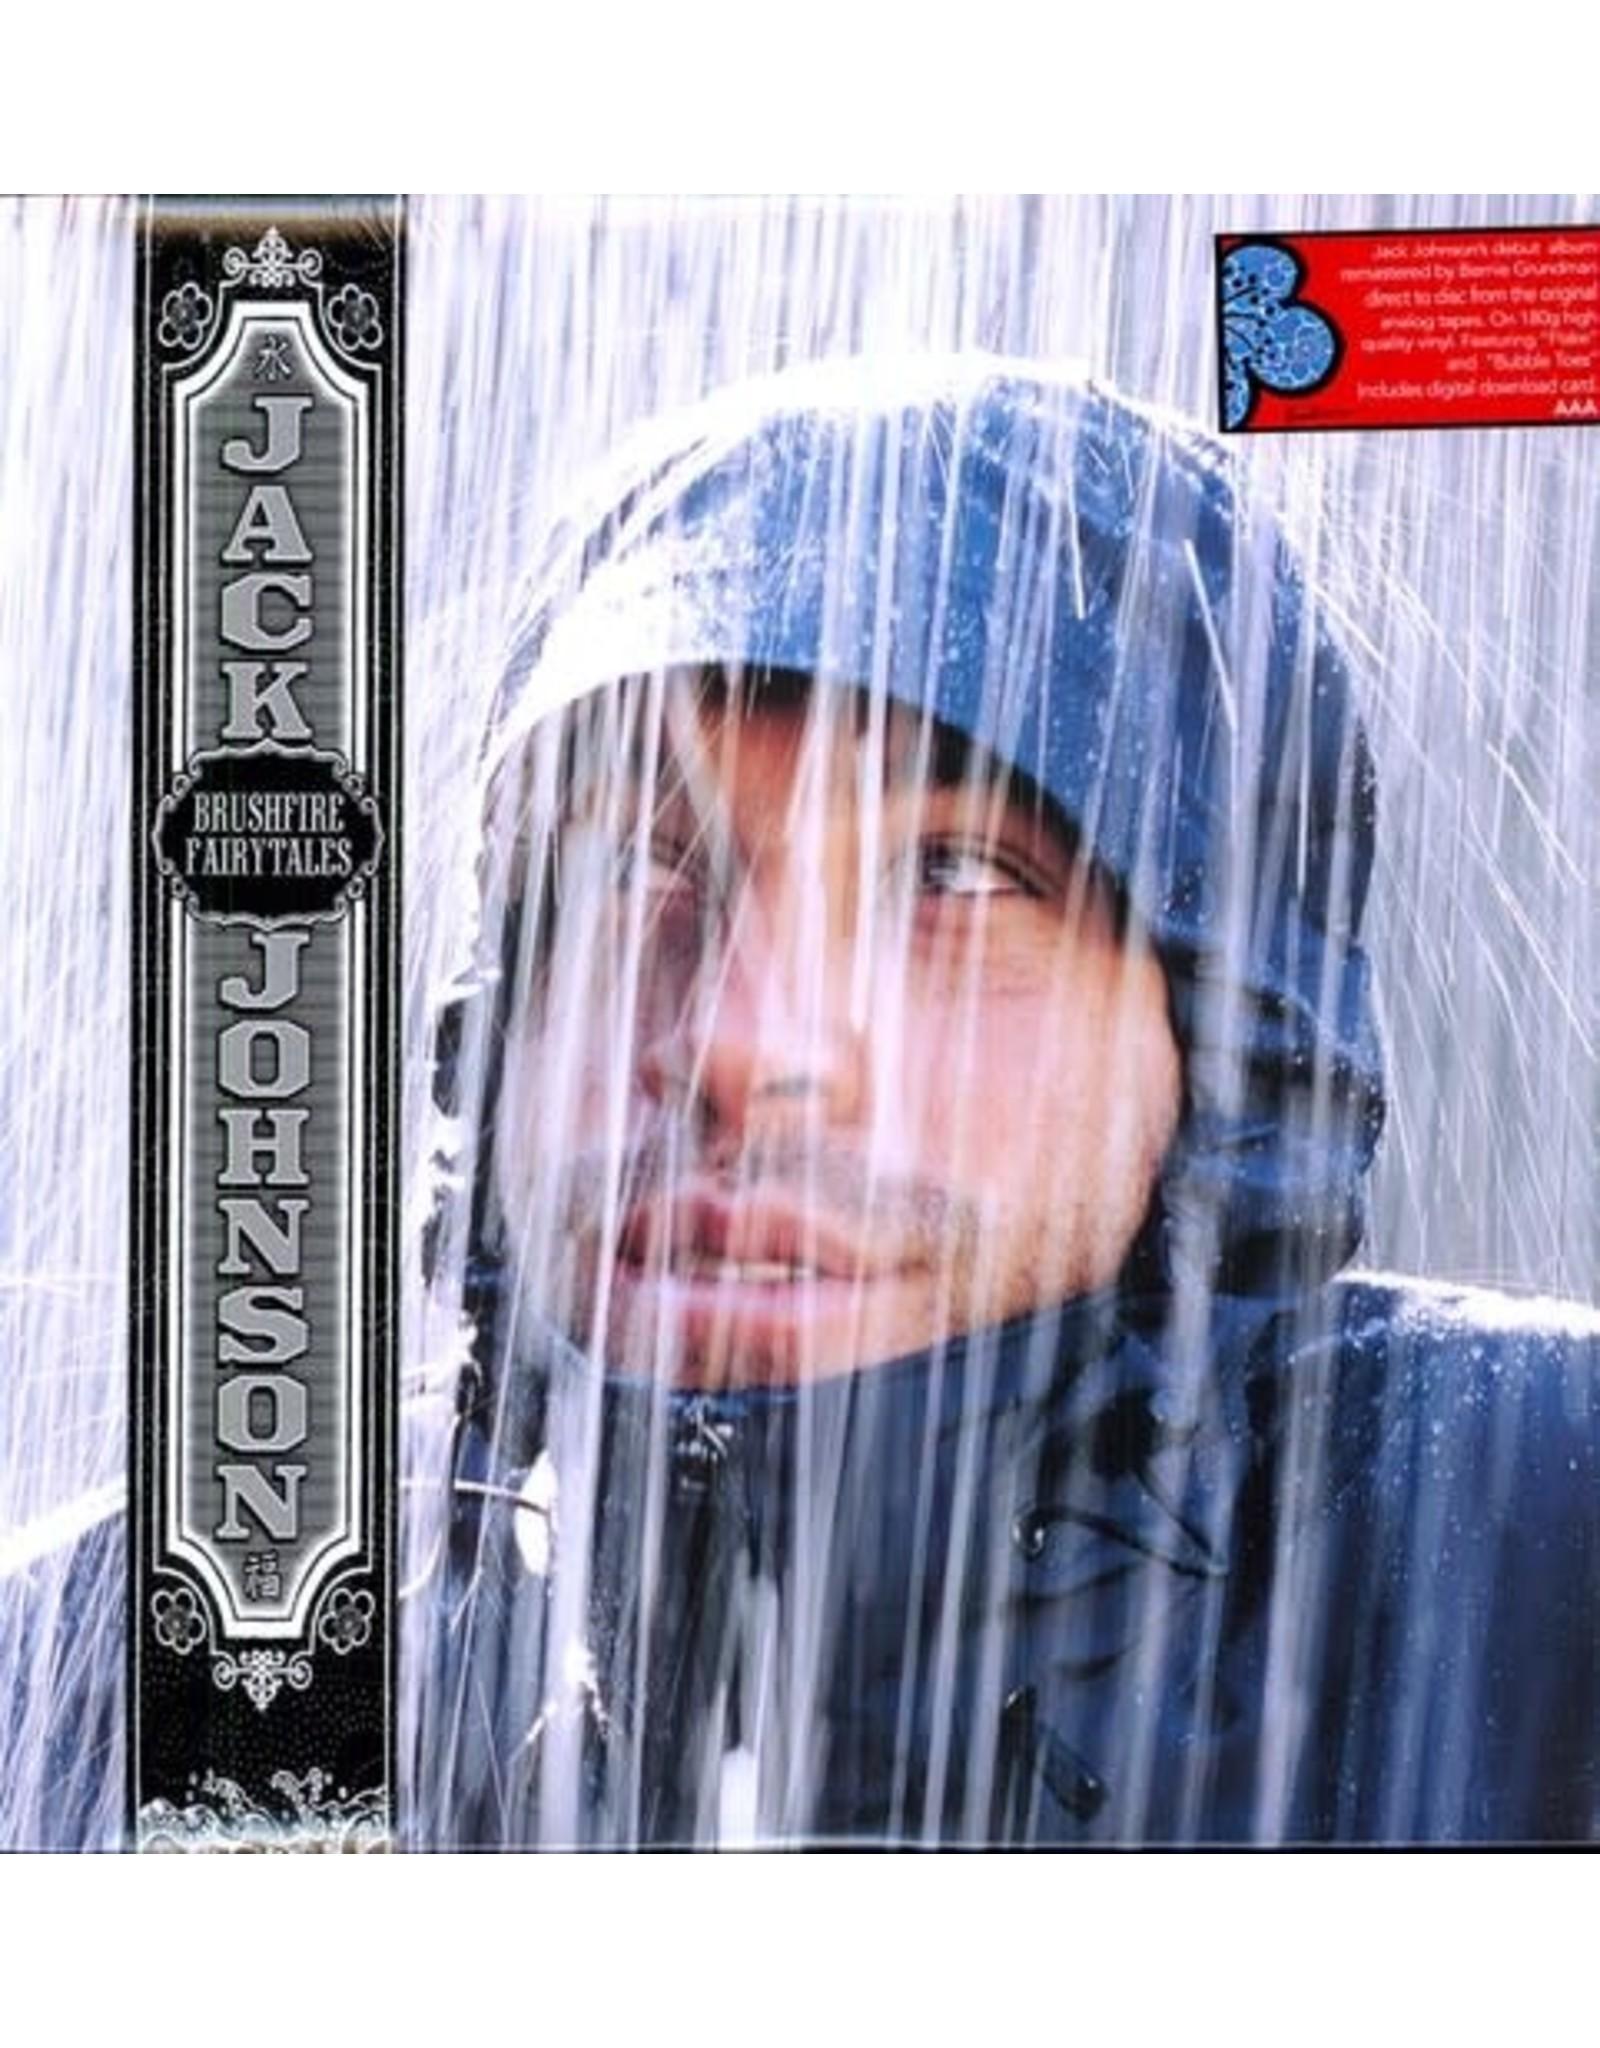 New Vinyl Jack Johnson - Brushfire Fairytales (20th Anniversary) LP